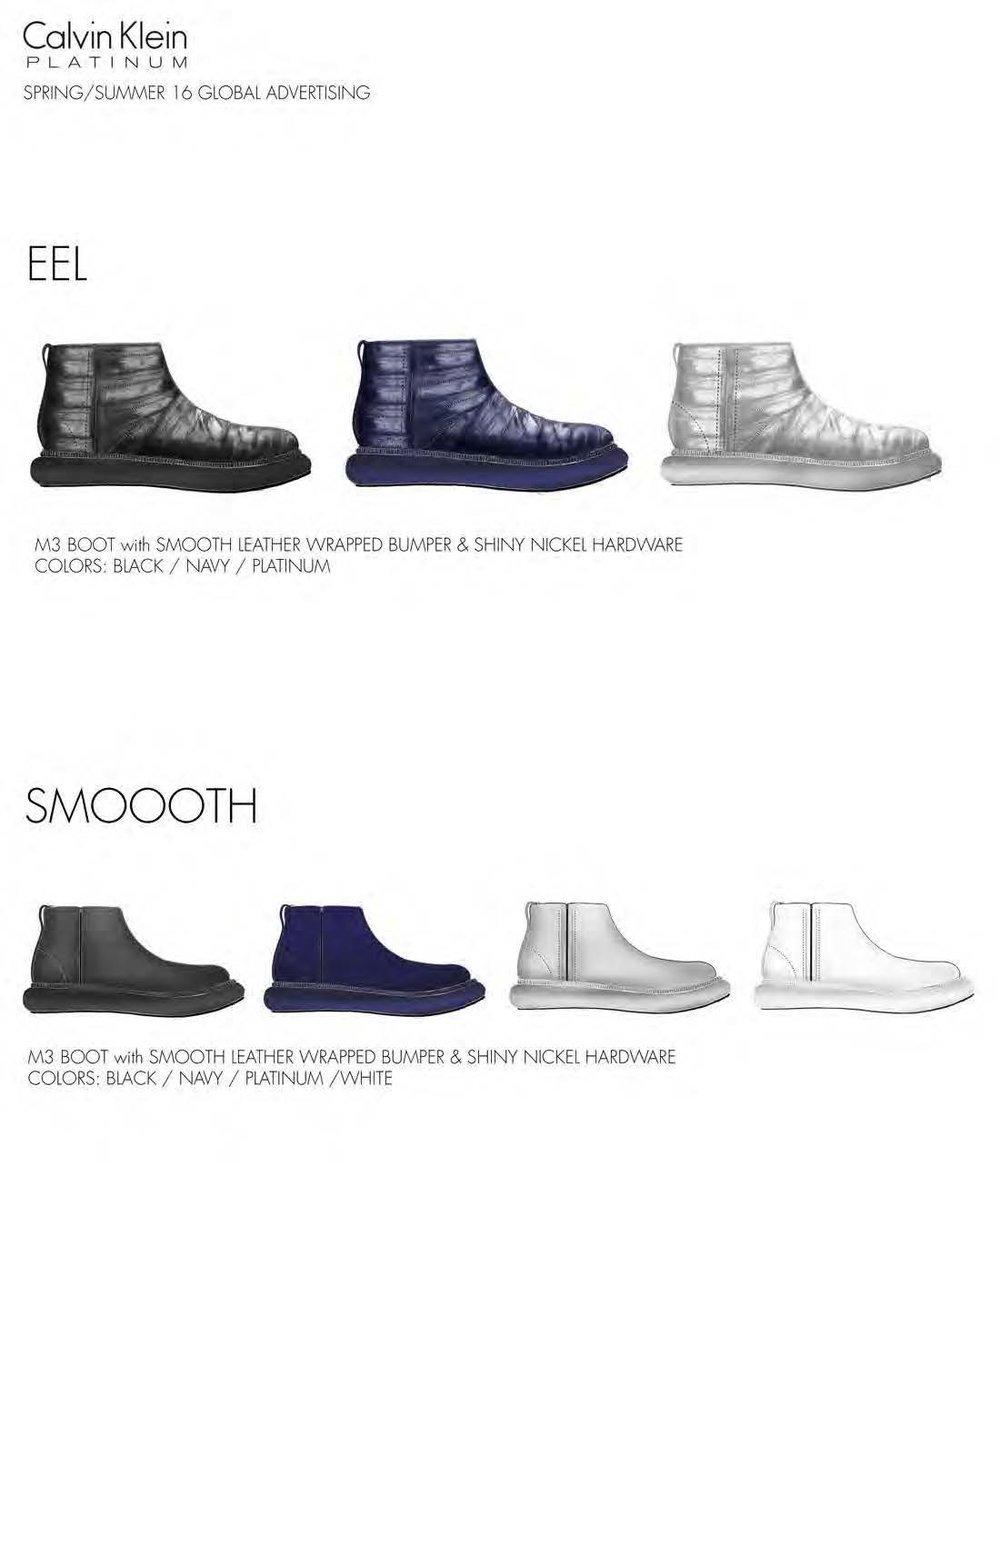 7.KGRESS Portfolio-SS16 CKP AD Footwear_Page_12.jpg